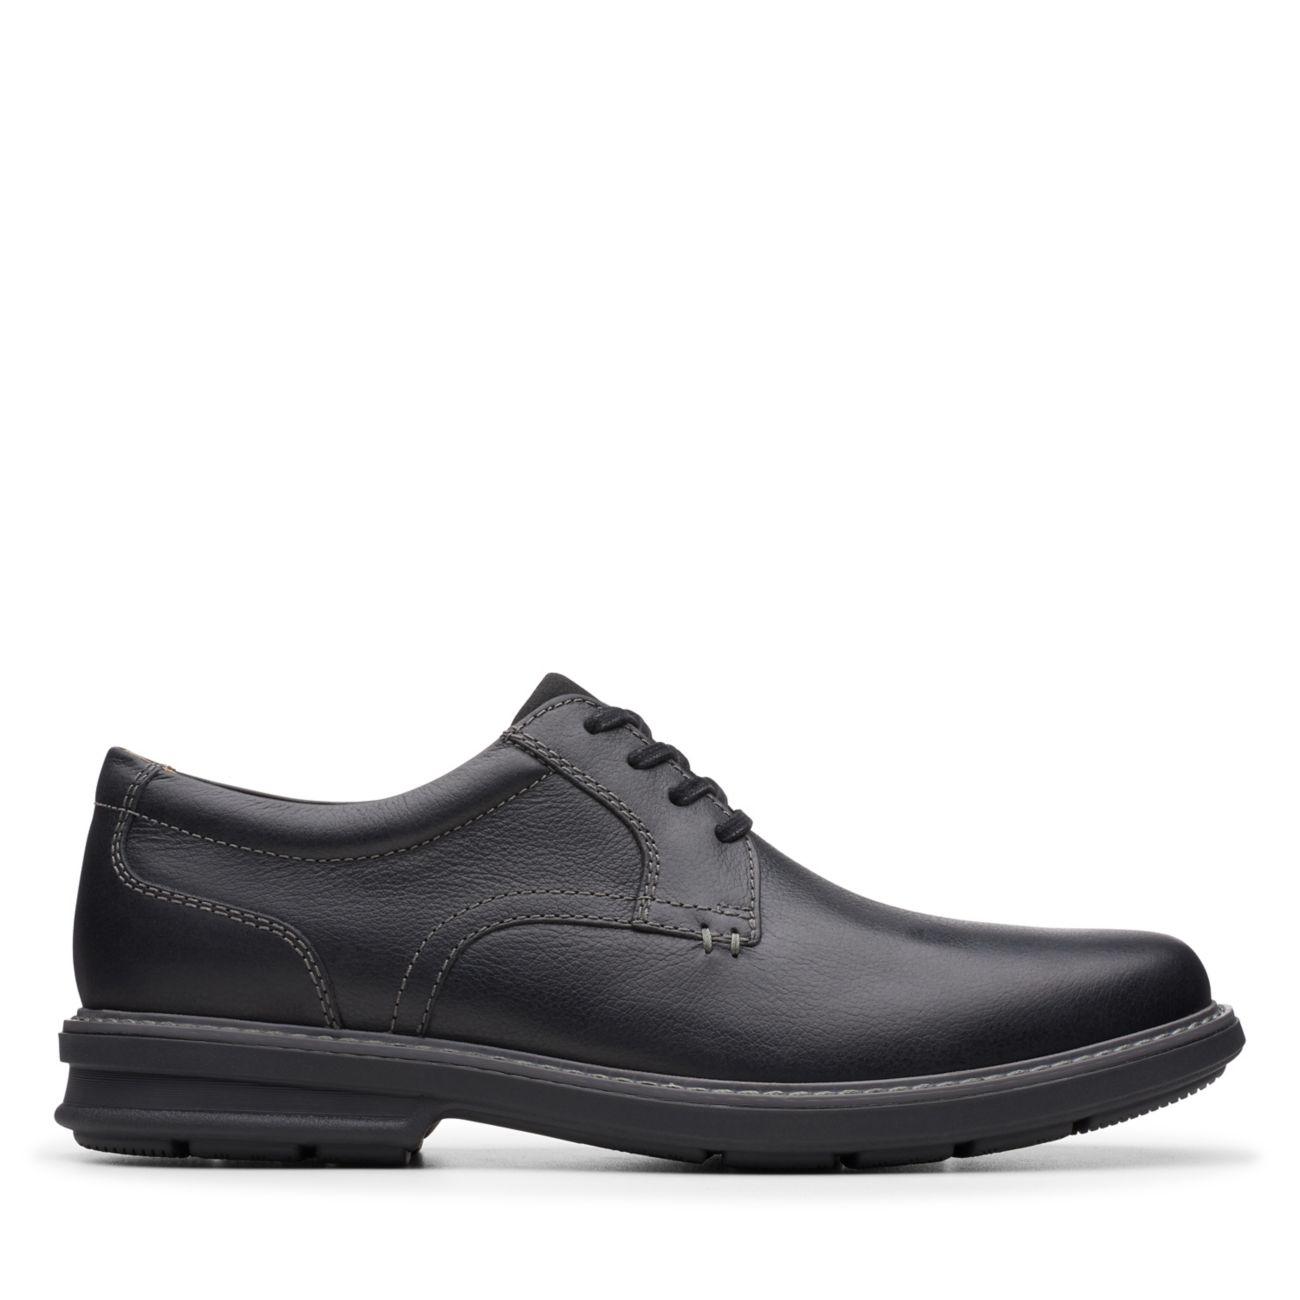 Rendell Plain Black Leather- Clarks® Shoes Official Site   Clarks